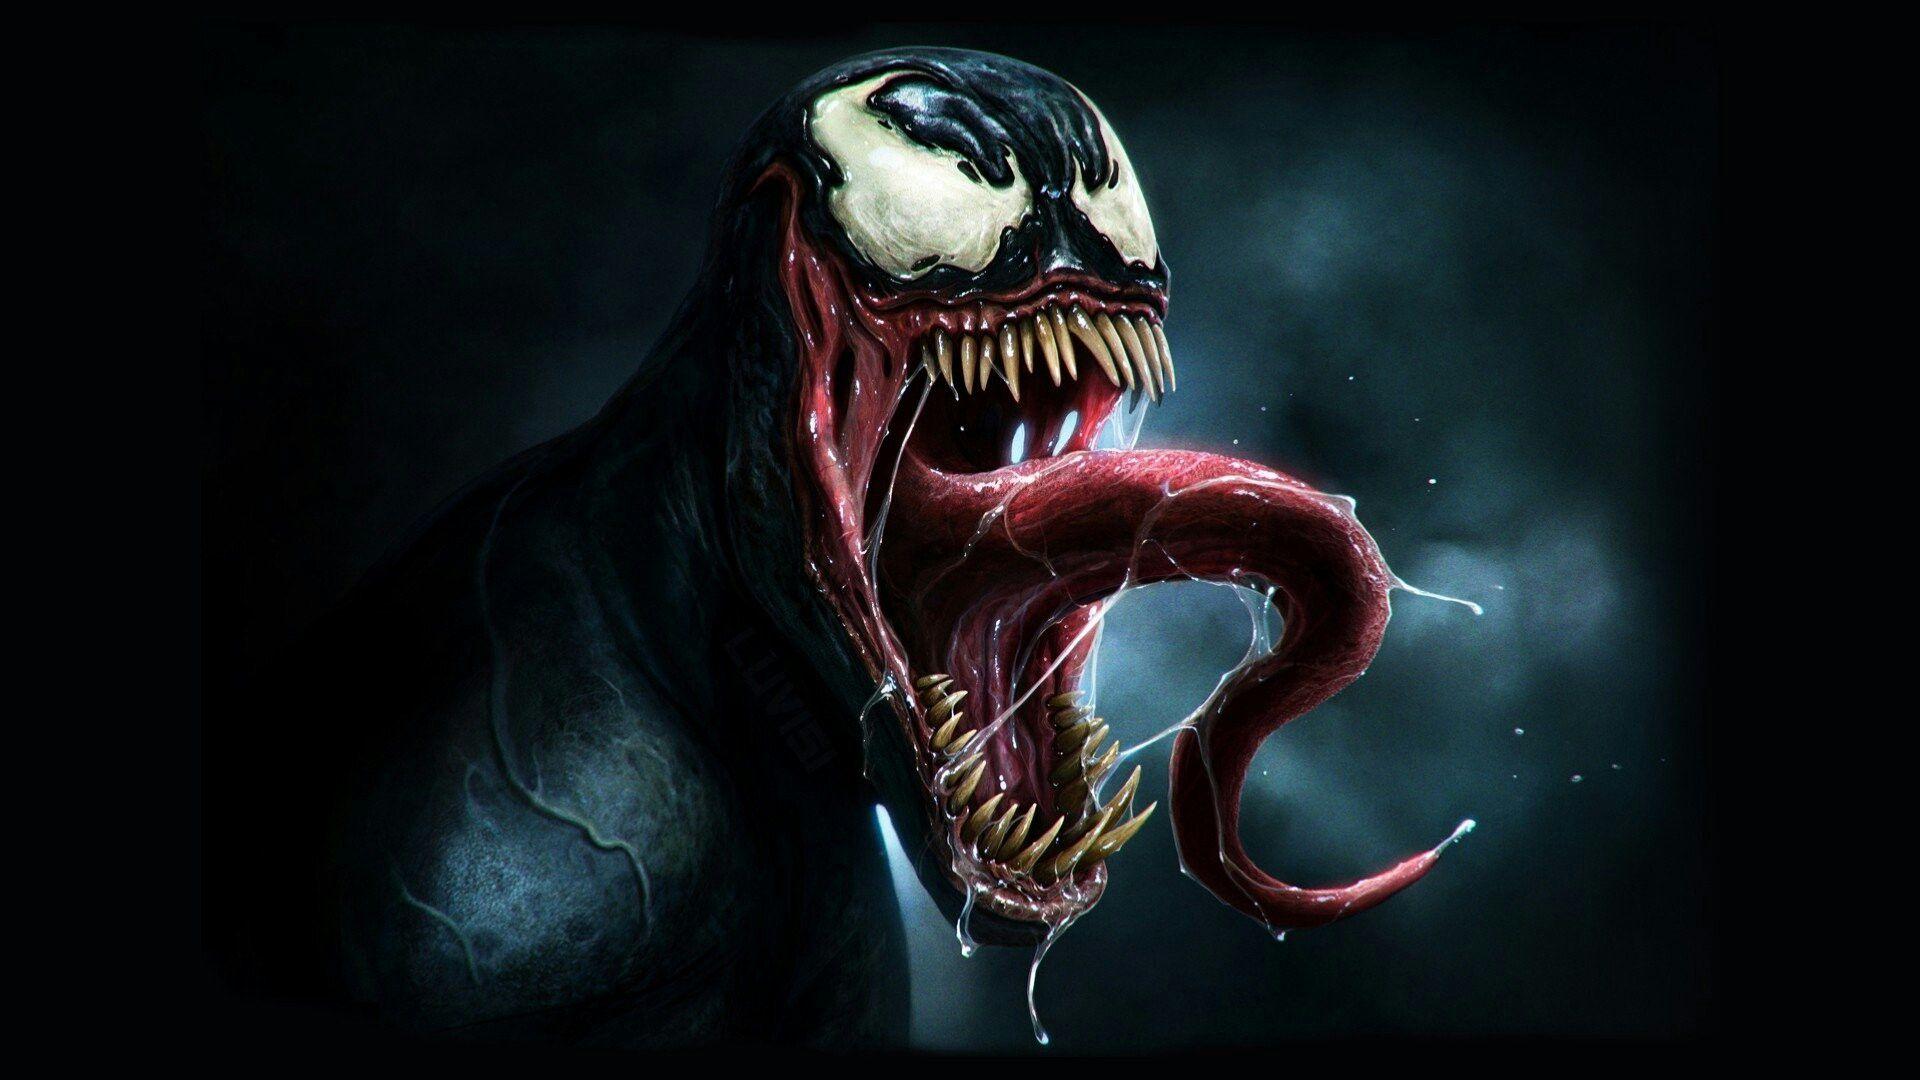 Pin by D. ECHANTIC on Marvel/DC Fantasy creatures, Dark